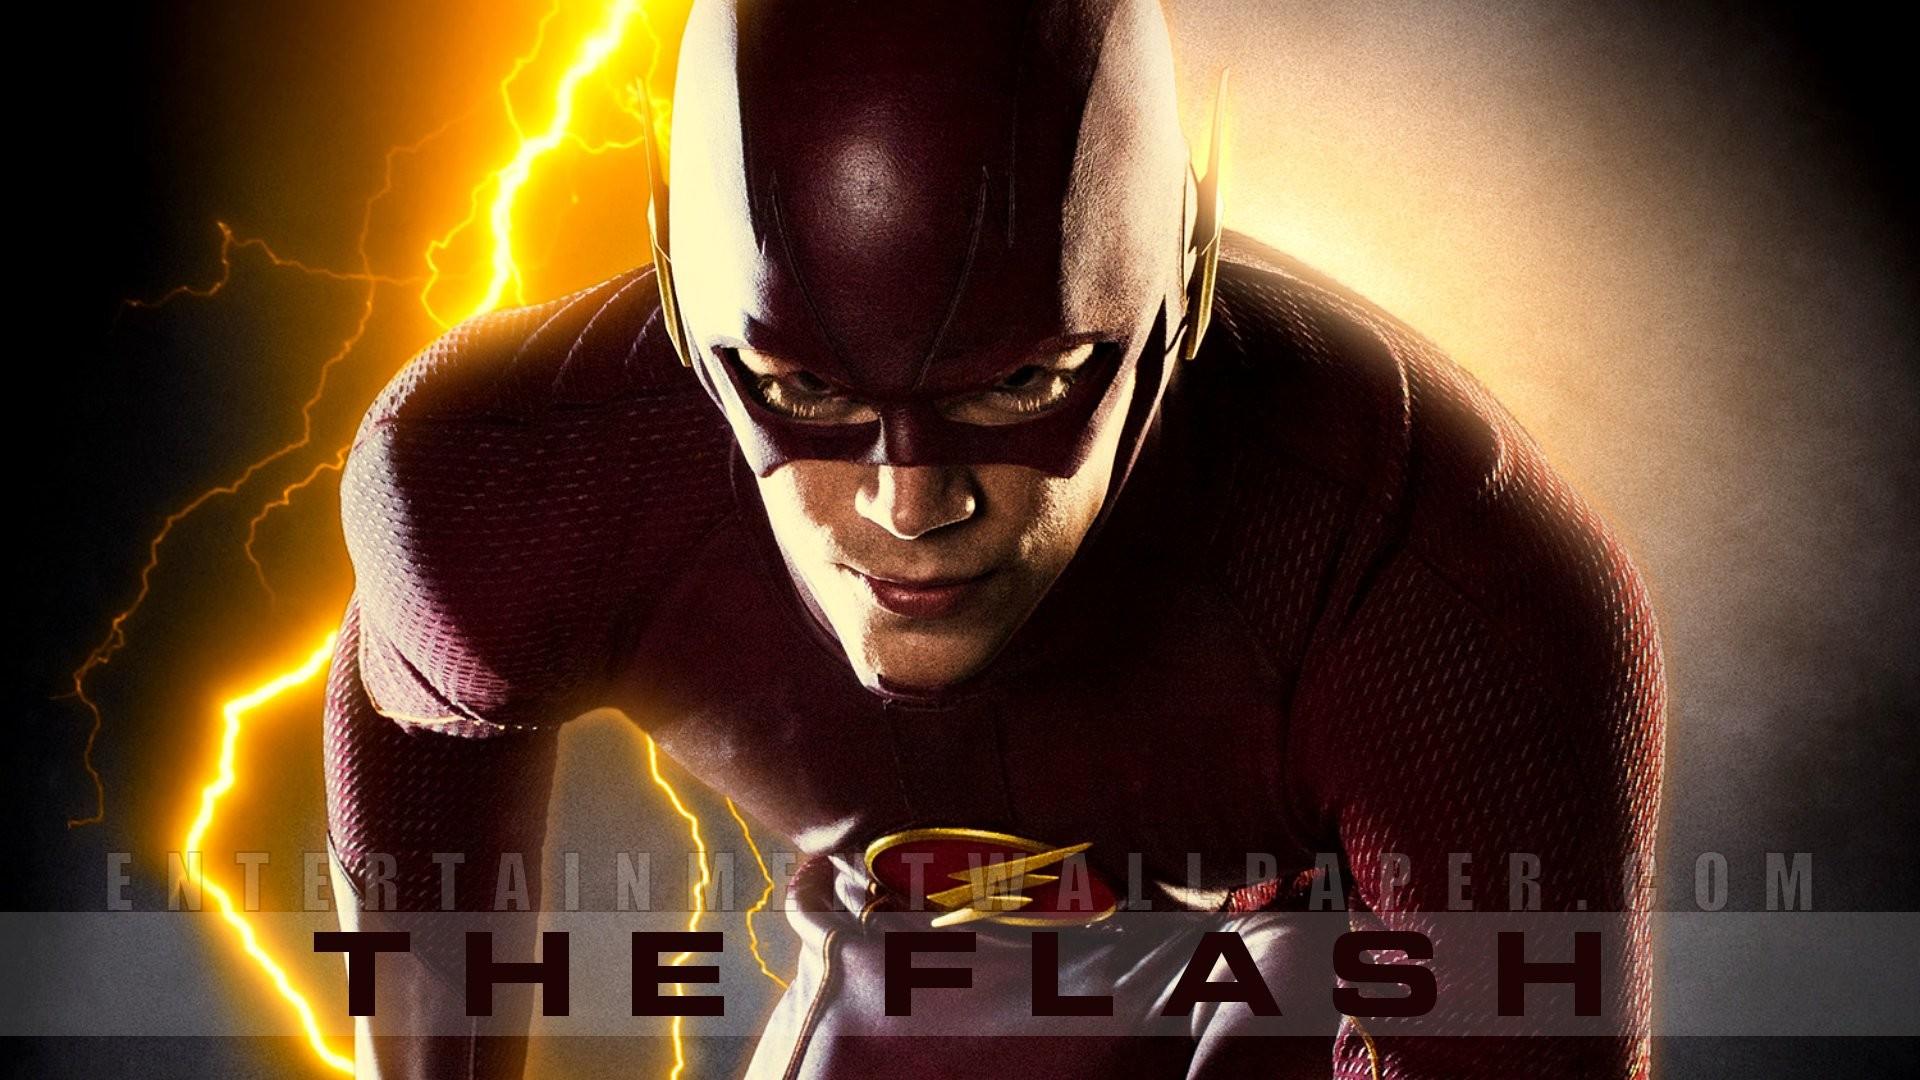 24. The Flash Wallpaper